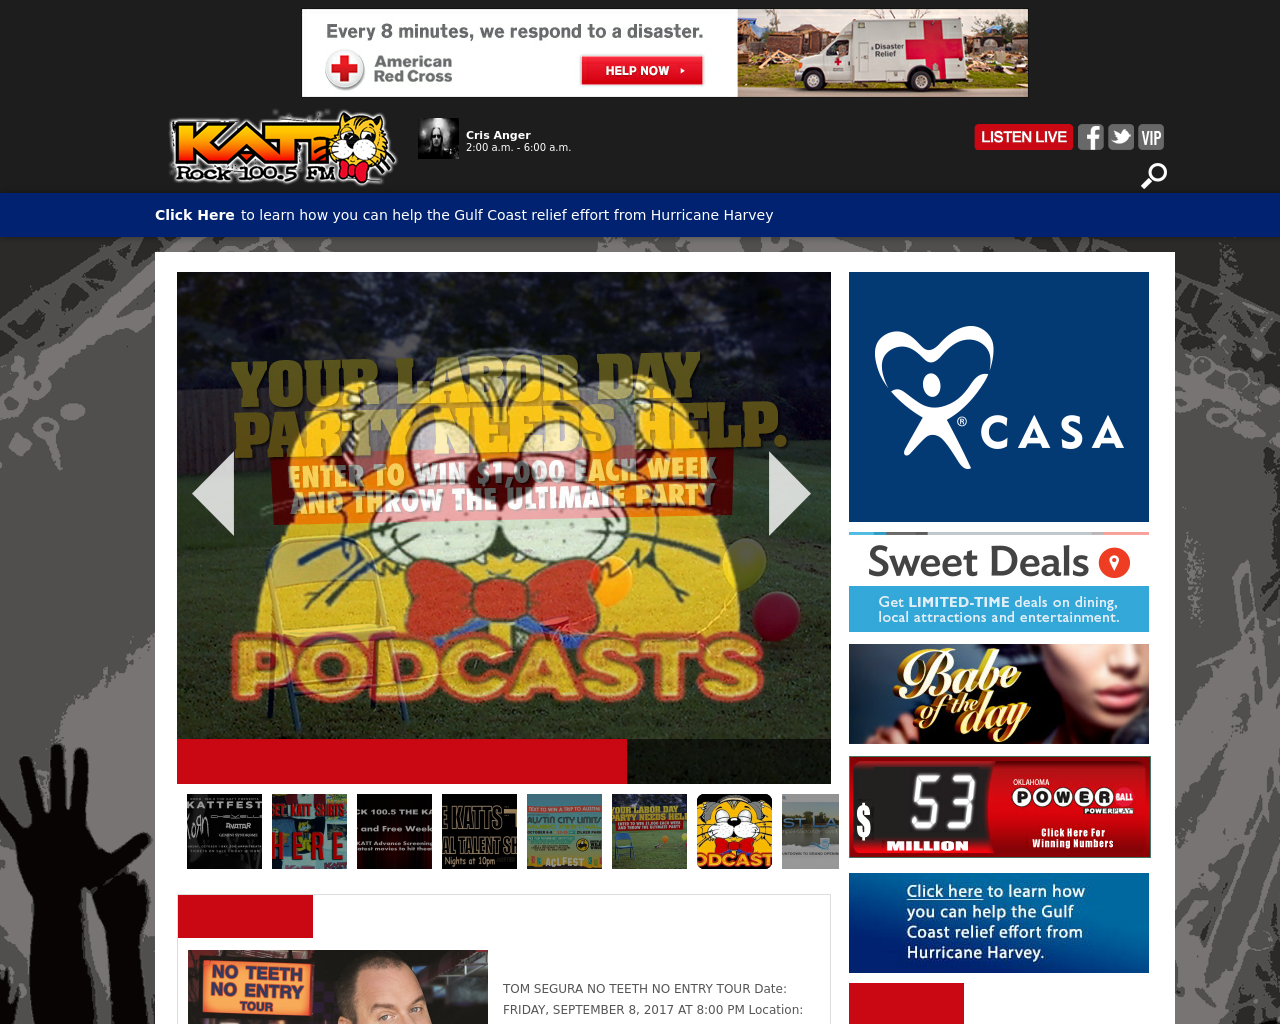 KATT-Rock-100.5-FM-Advertising-Reviews-Pricing